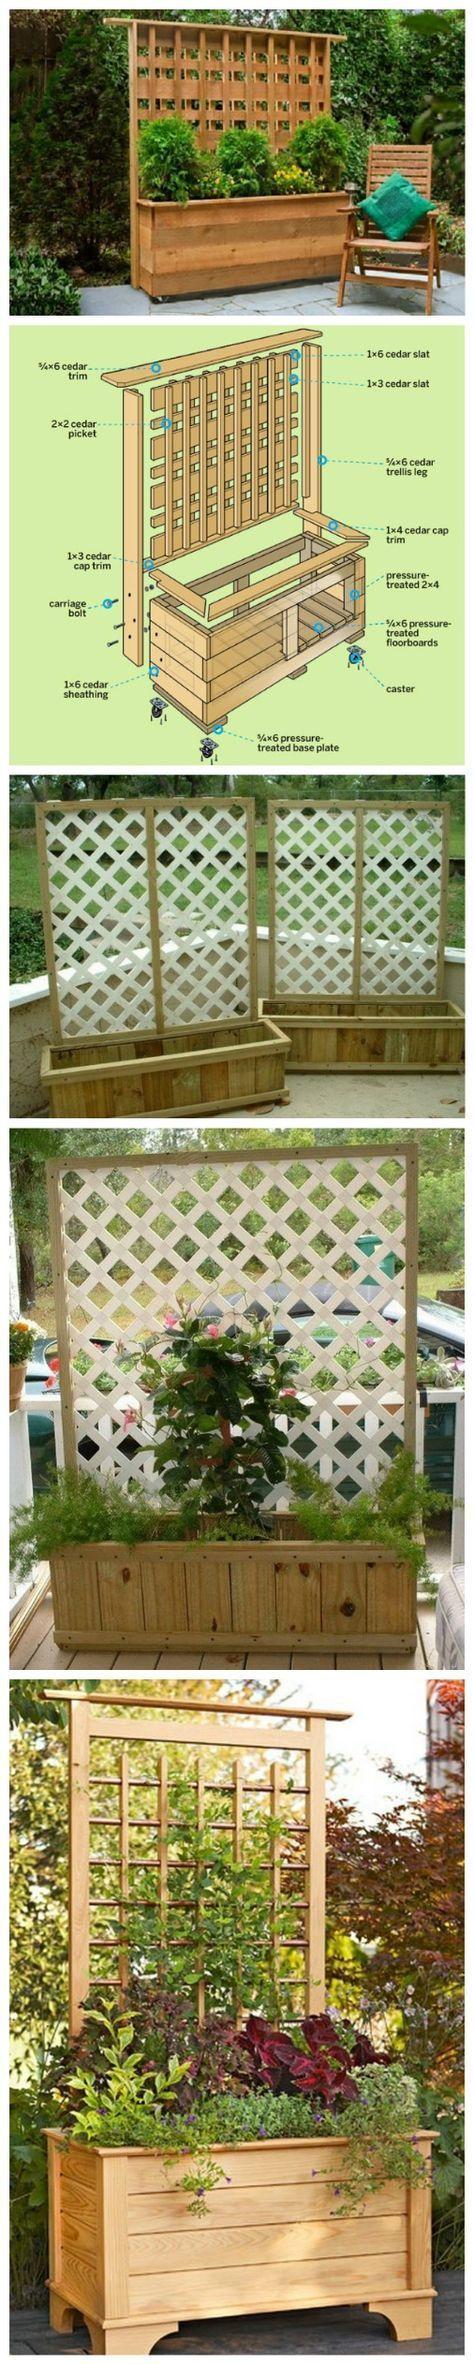 22 Wonderful Pallet Fence Ideas for Backyard